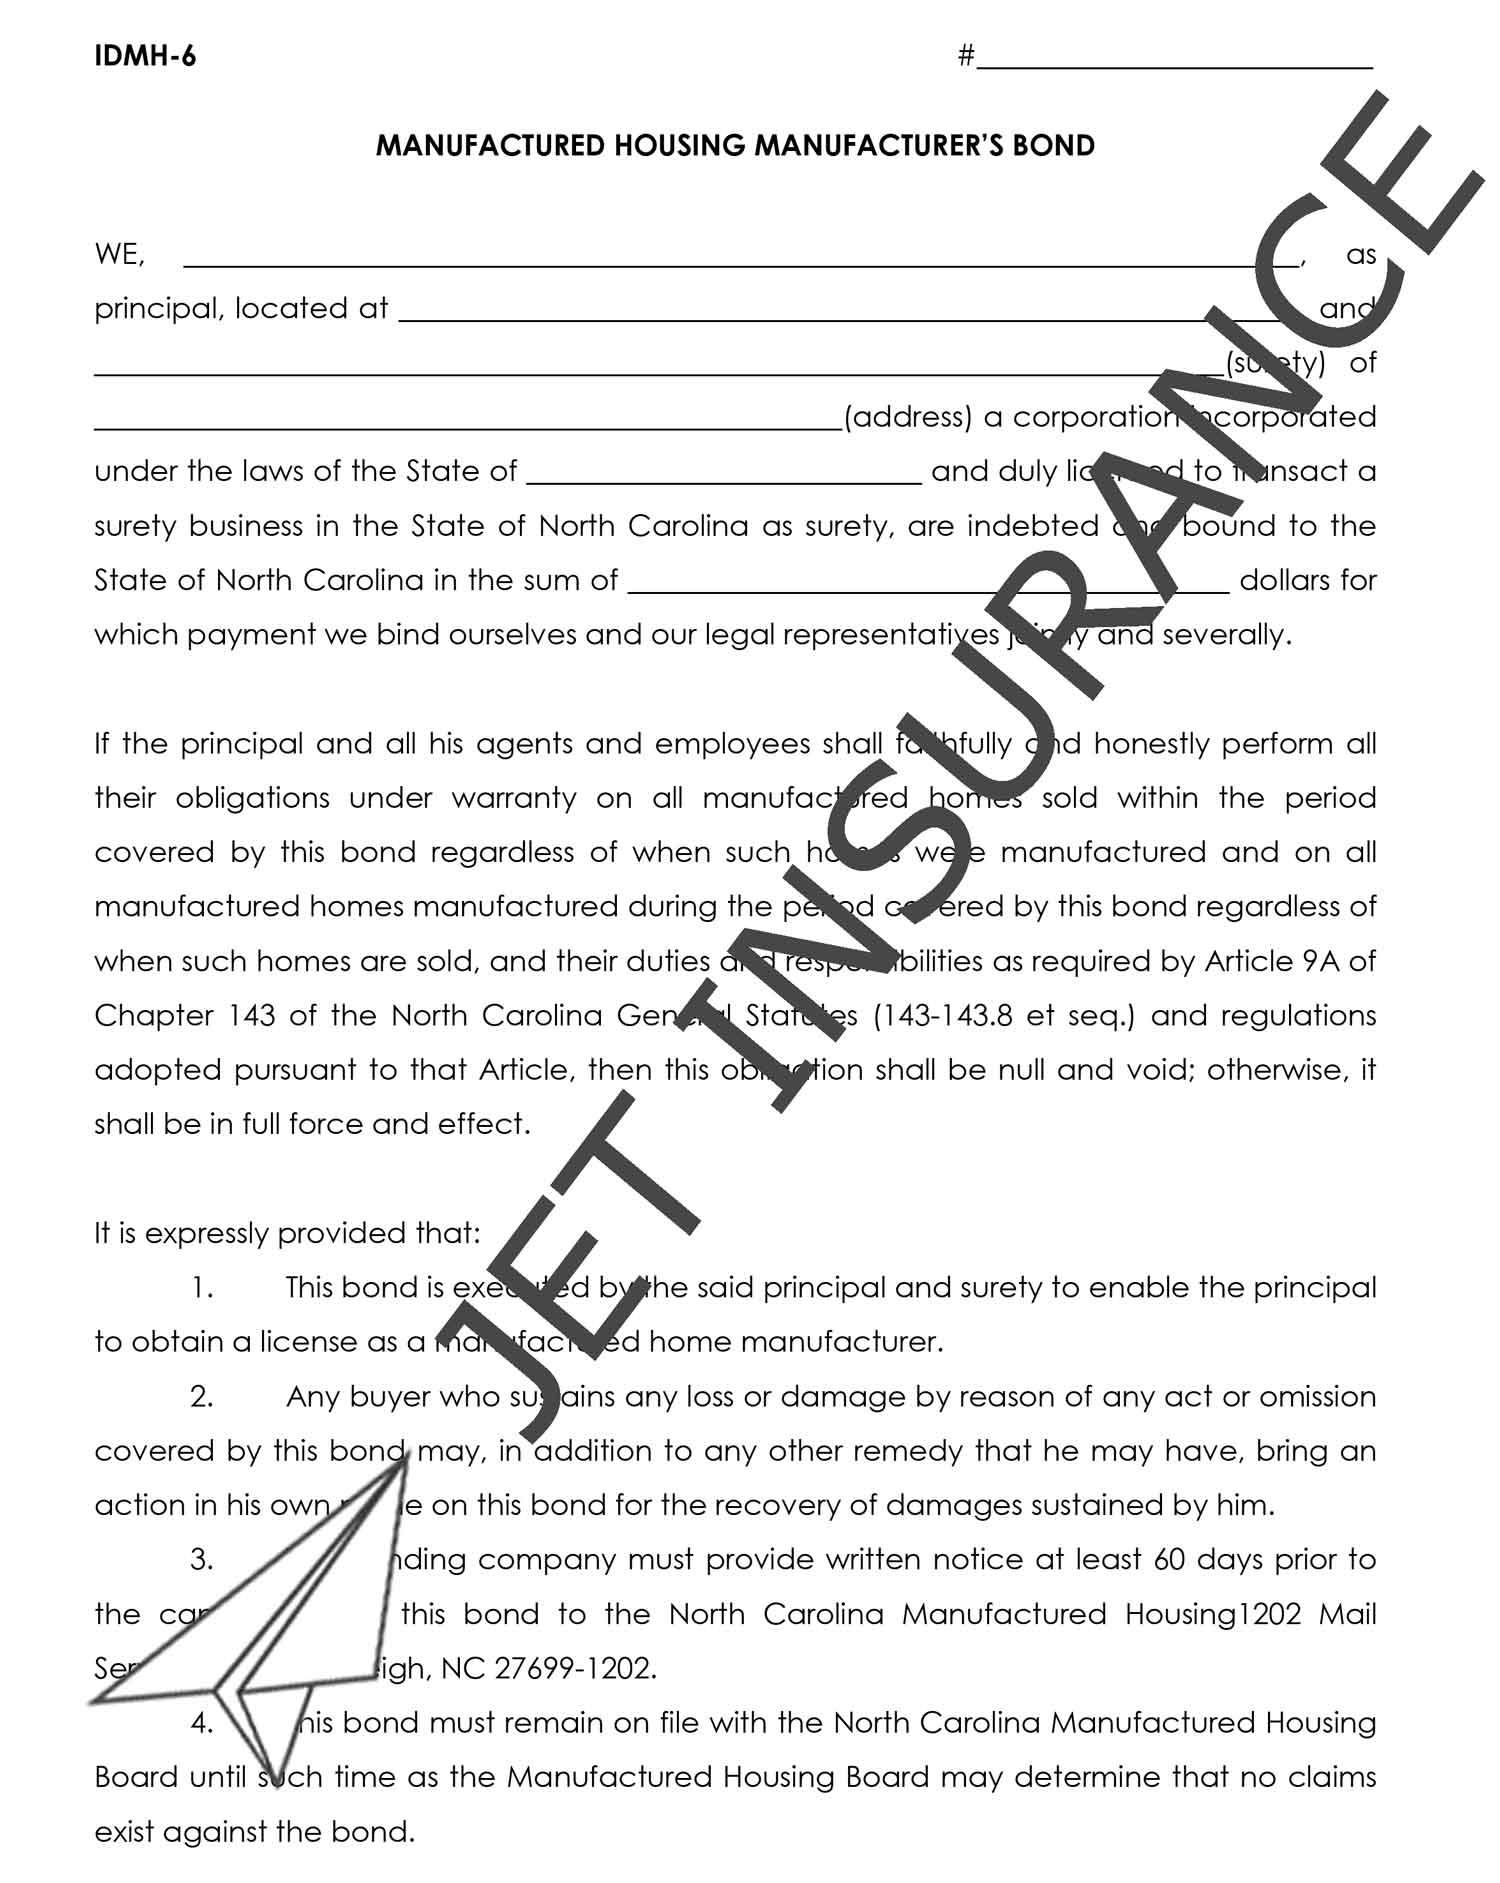 North Carolina Manufactured Housing Manufacturer's Bond Form